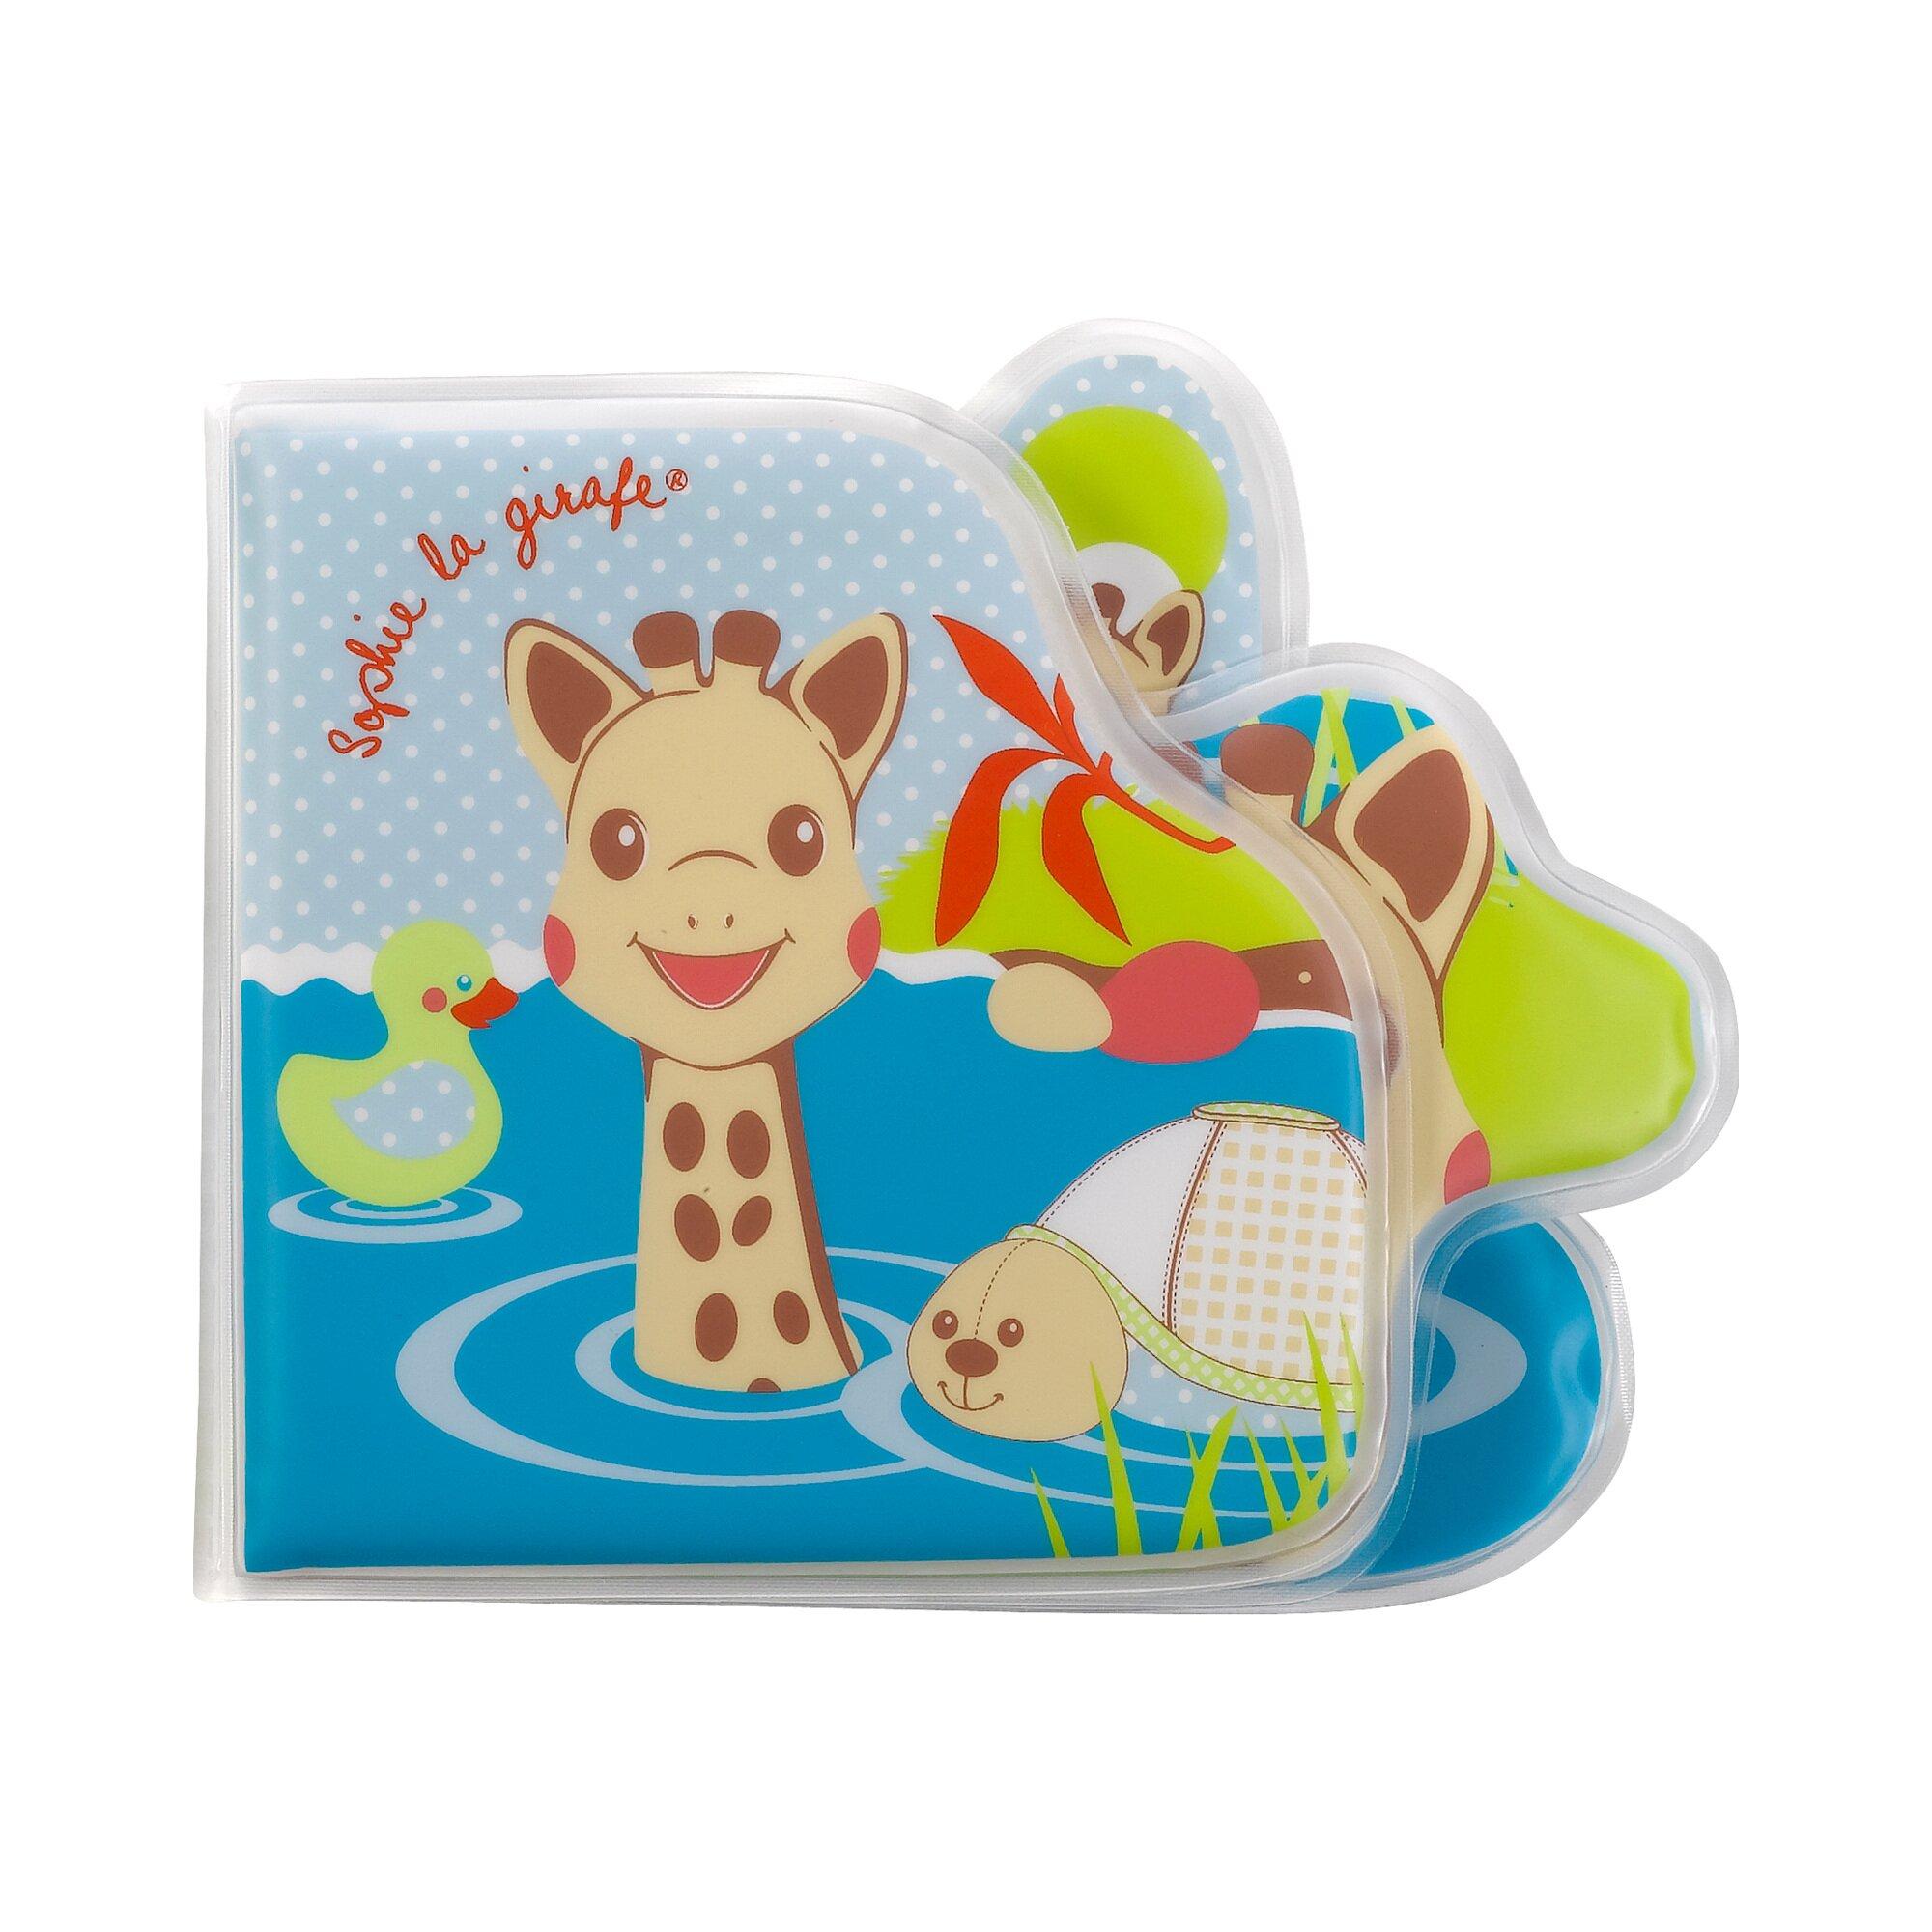 Sophie La Girafe Badespielzeug Badebuch